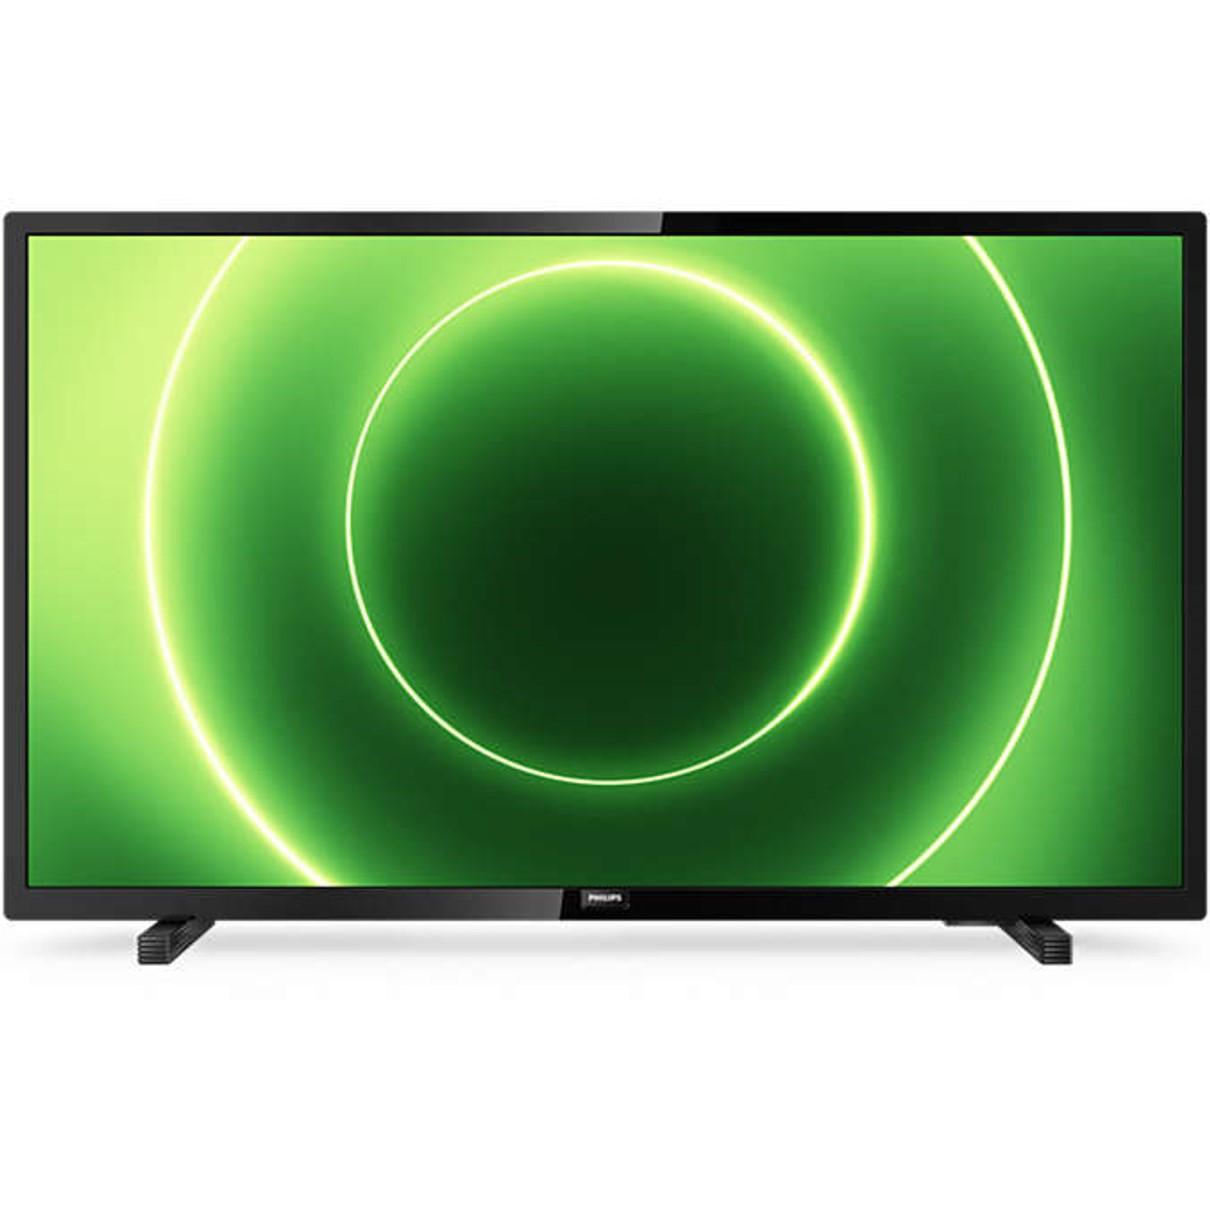 "TV SAMSUNG 32"" LED HD READY/ 32PHS6605/ SMART TV/ 3 HDMI/ 2 USB/ DVB-T/T2/T2-HD/C/S/S2/ WIFI"